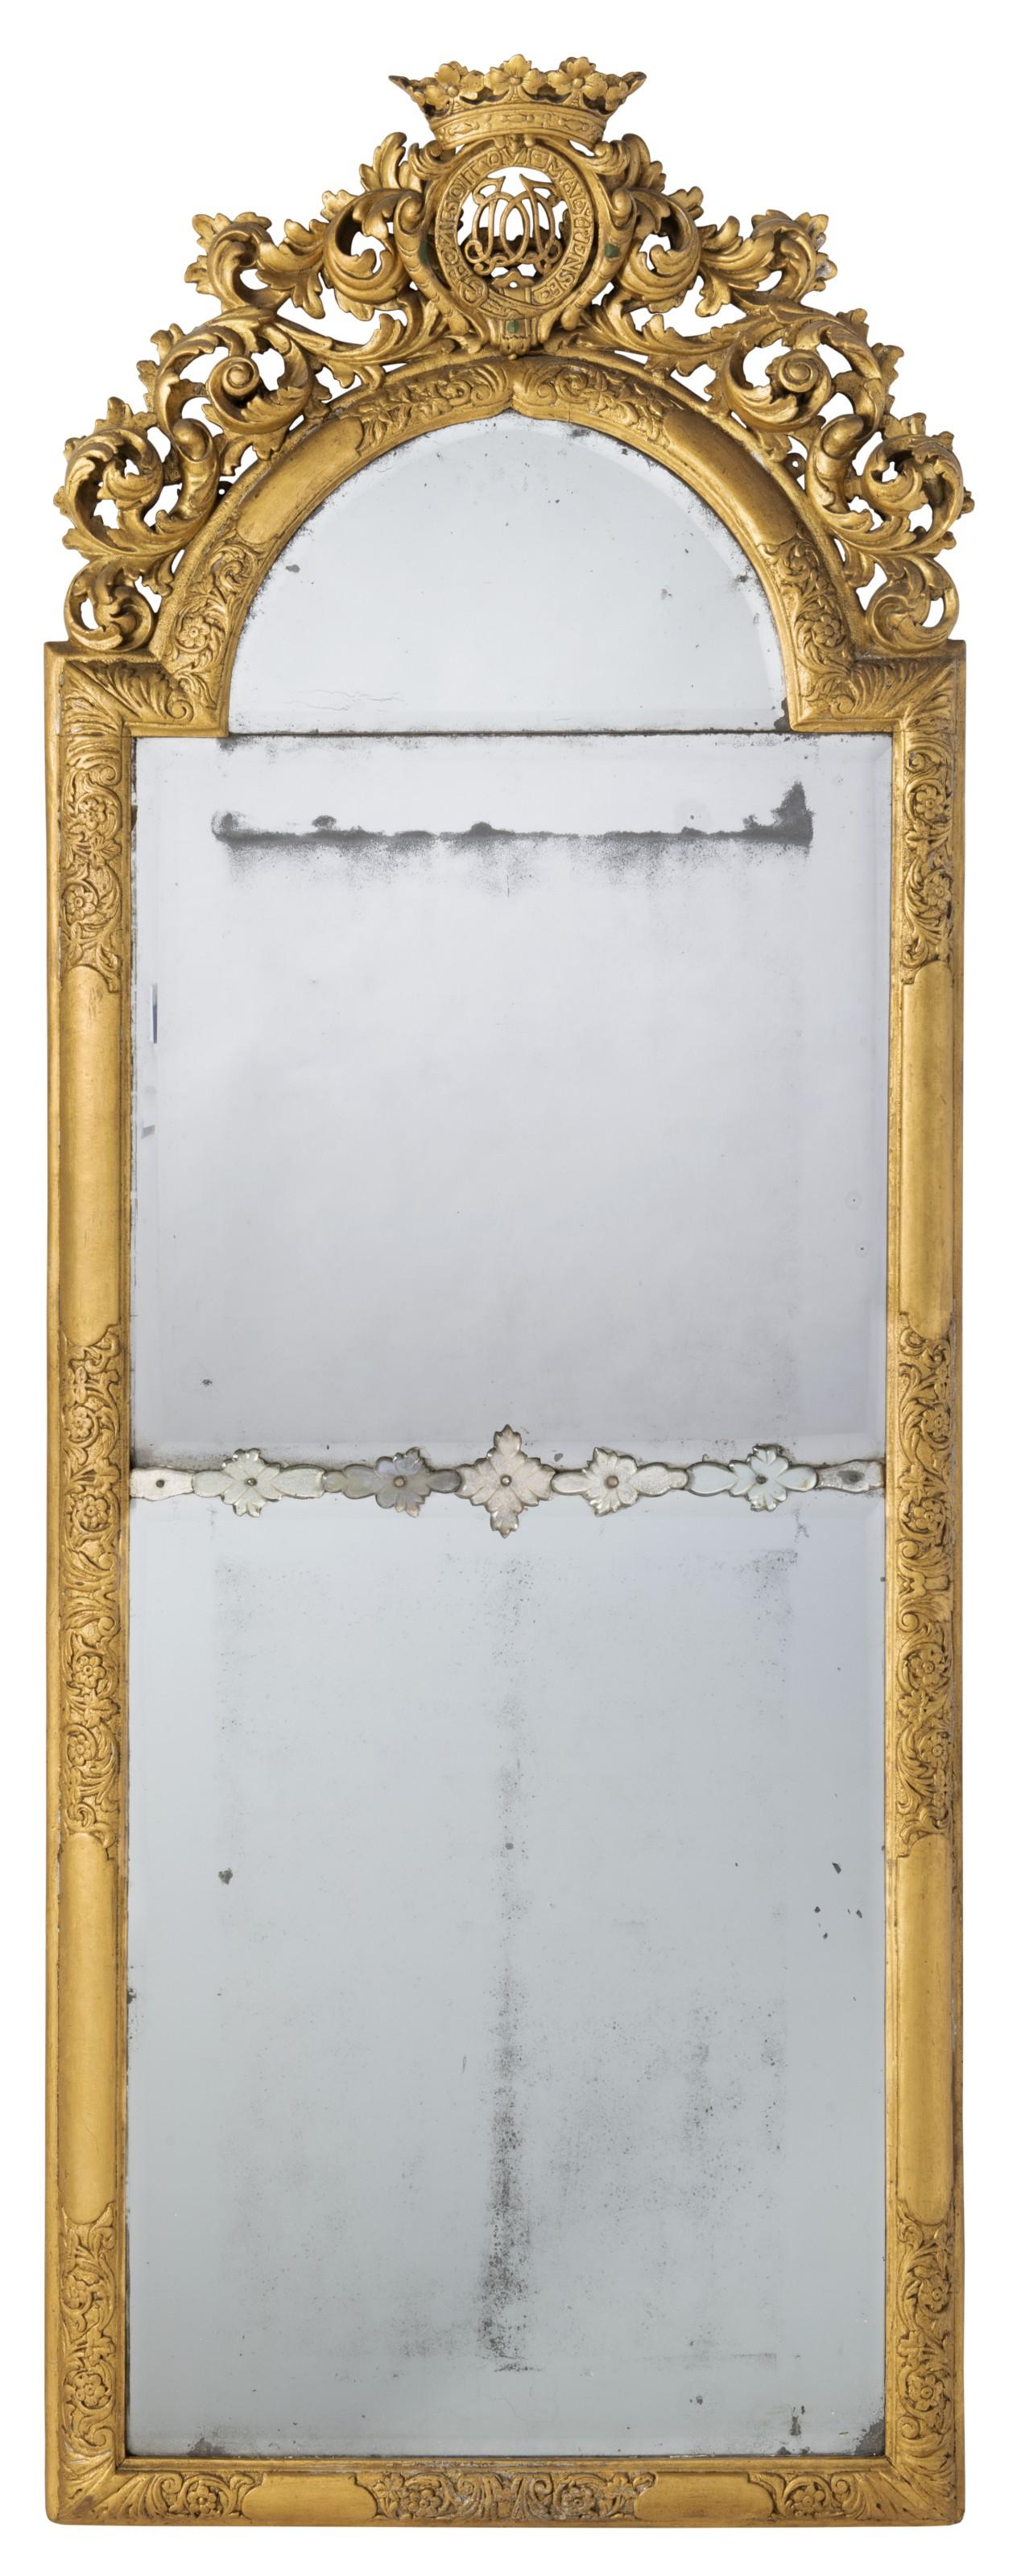 A PAIR OF QUEEN ANNE GILT-GESSO PIER GLASSES